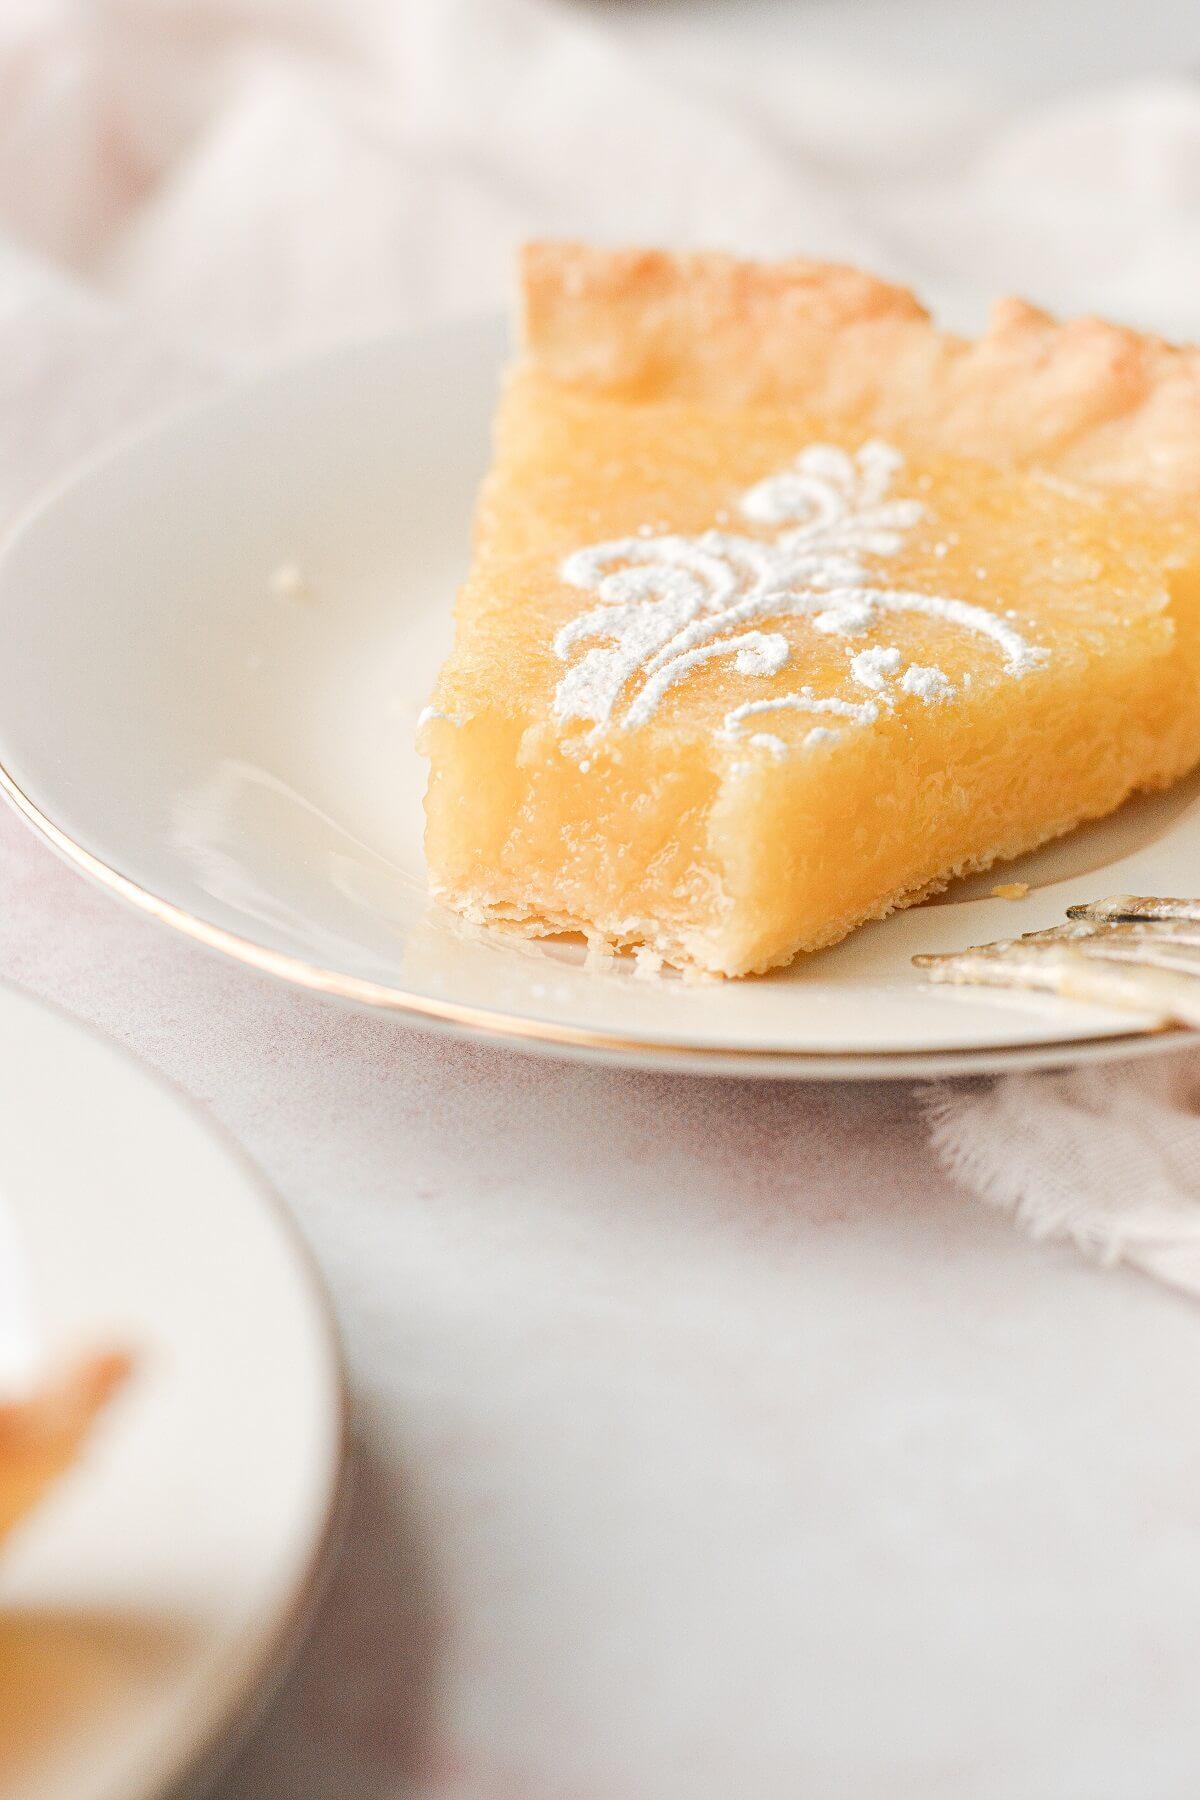 A slice of lemon tart with a bite taken.